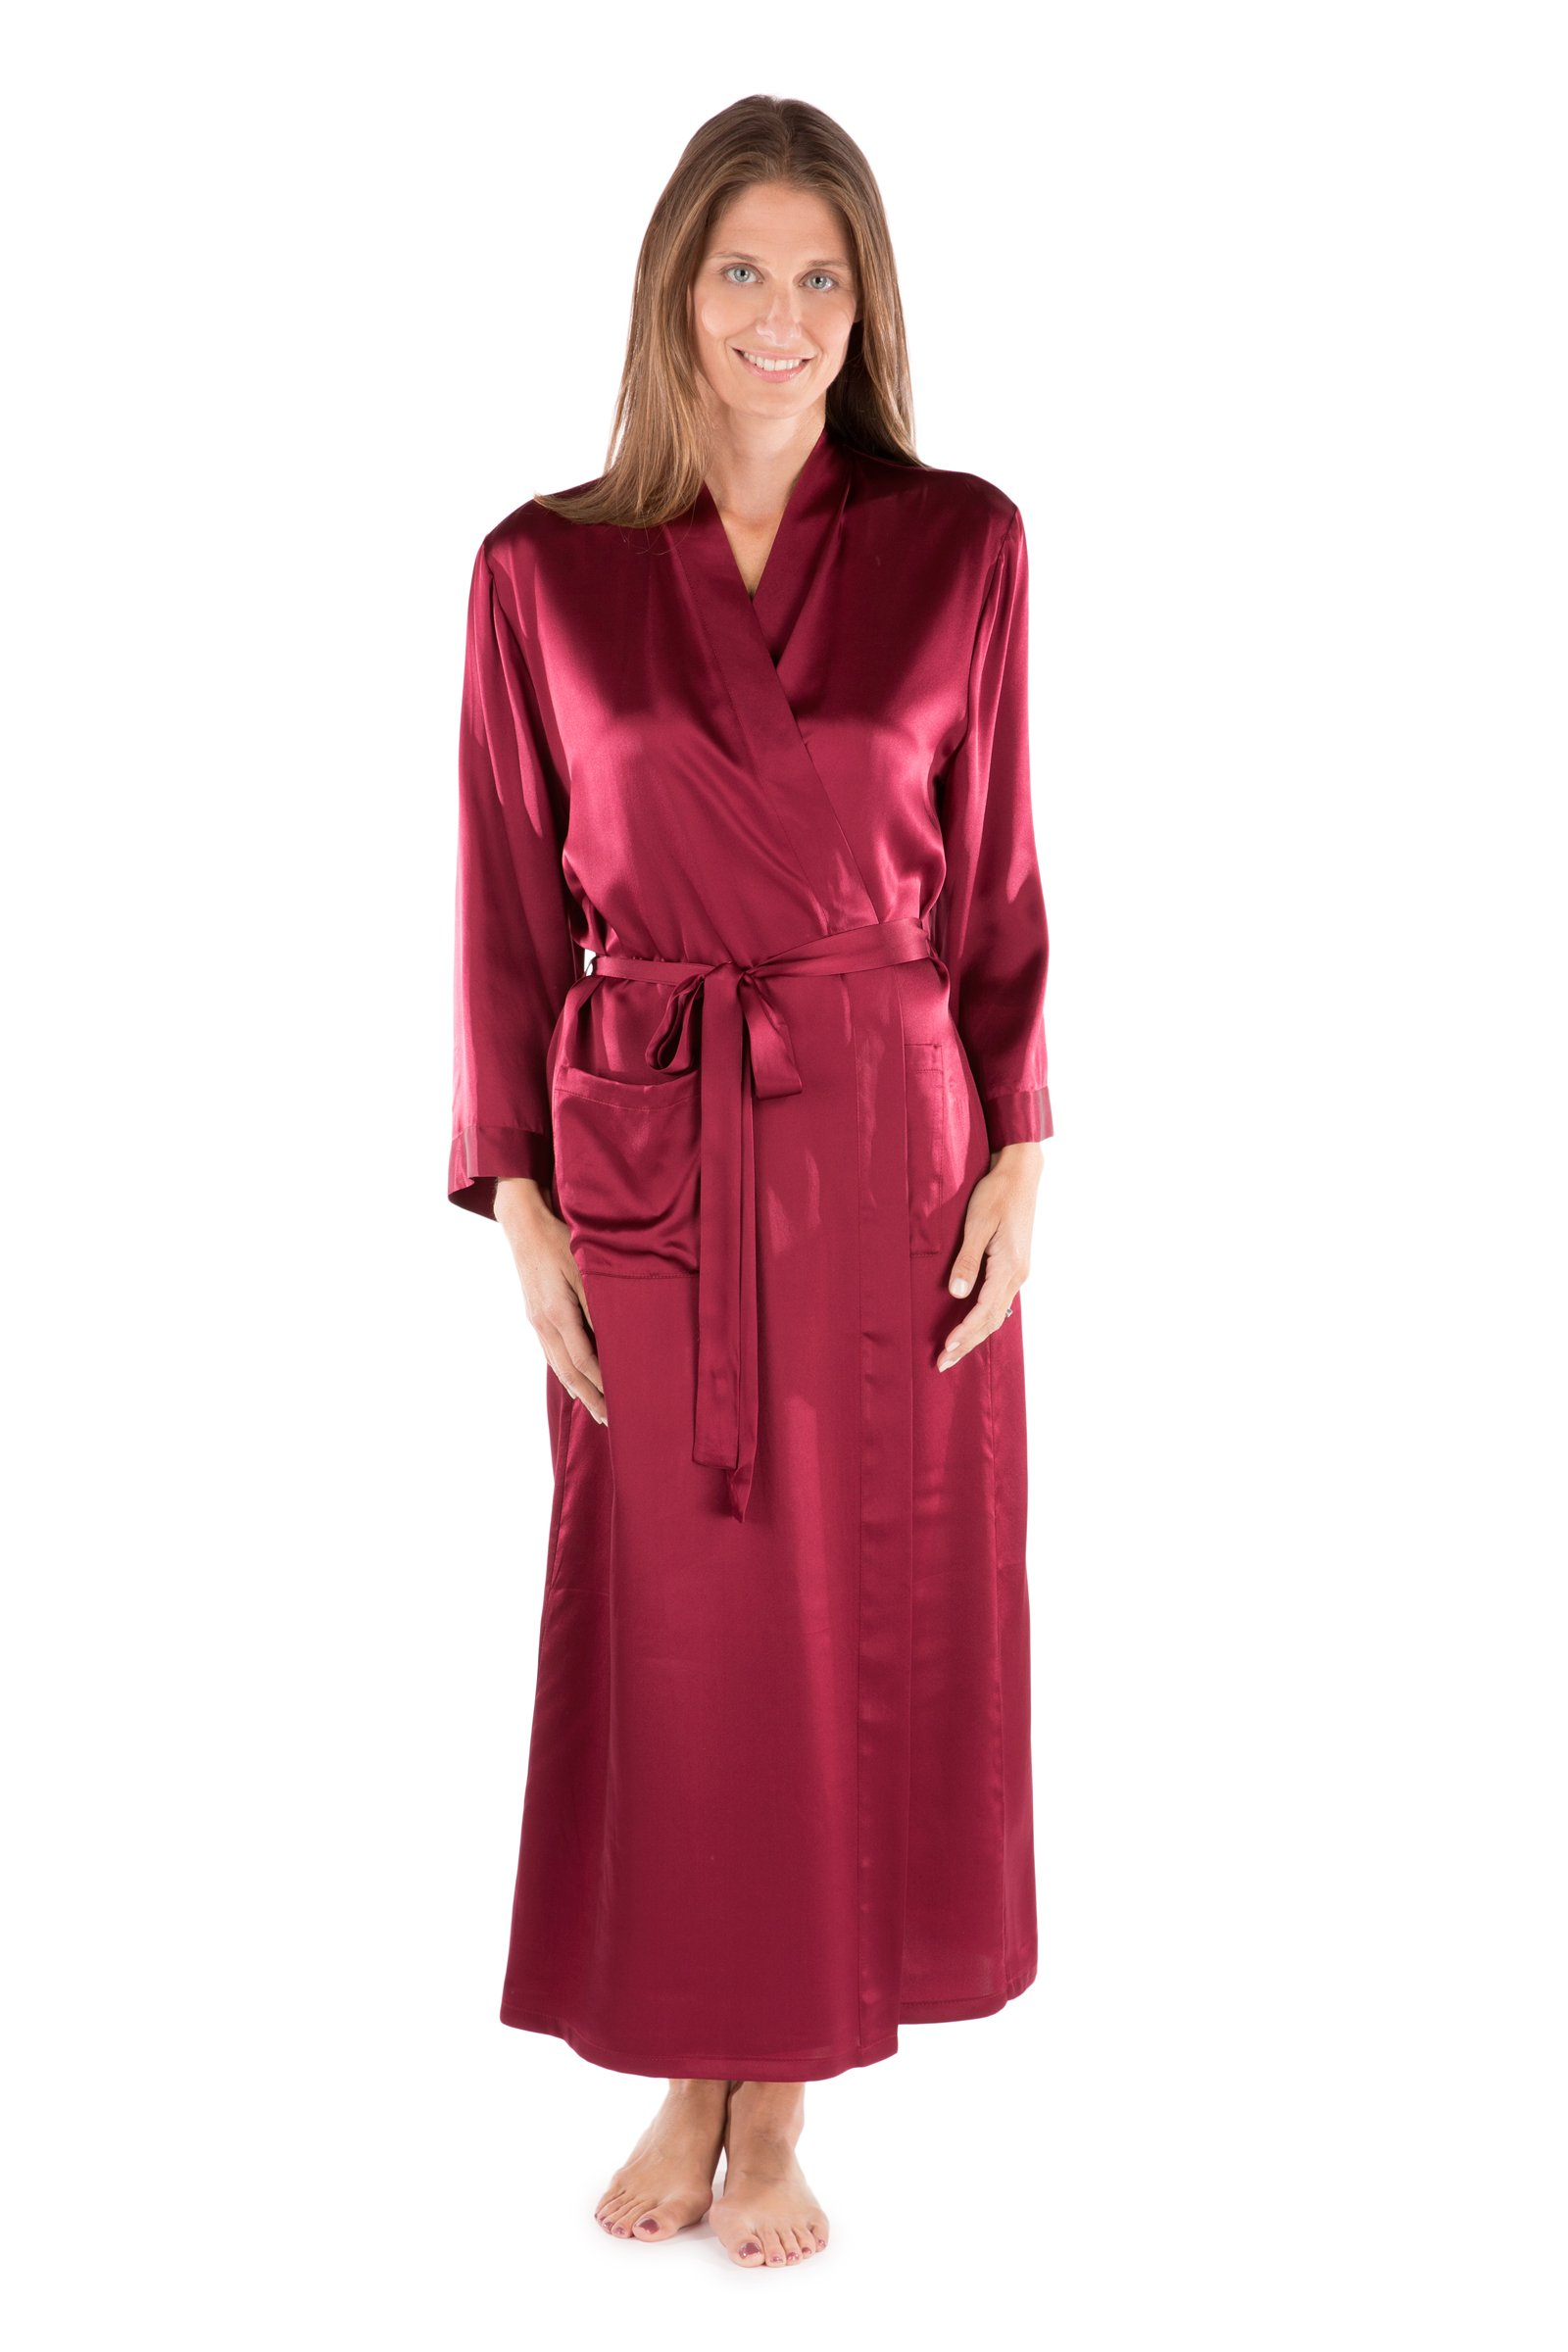 Women's 100% Long Silk Robe - Luxury Bathrobe by TexereSilk (Perla Naturale, Wine, Small/Medium) Luxury Gifts for Daughter Wife Fiancee WS0101-WNE-SM